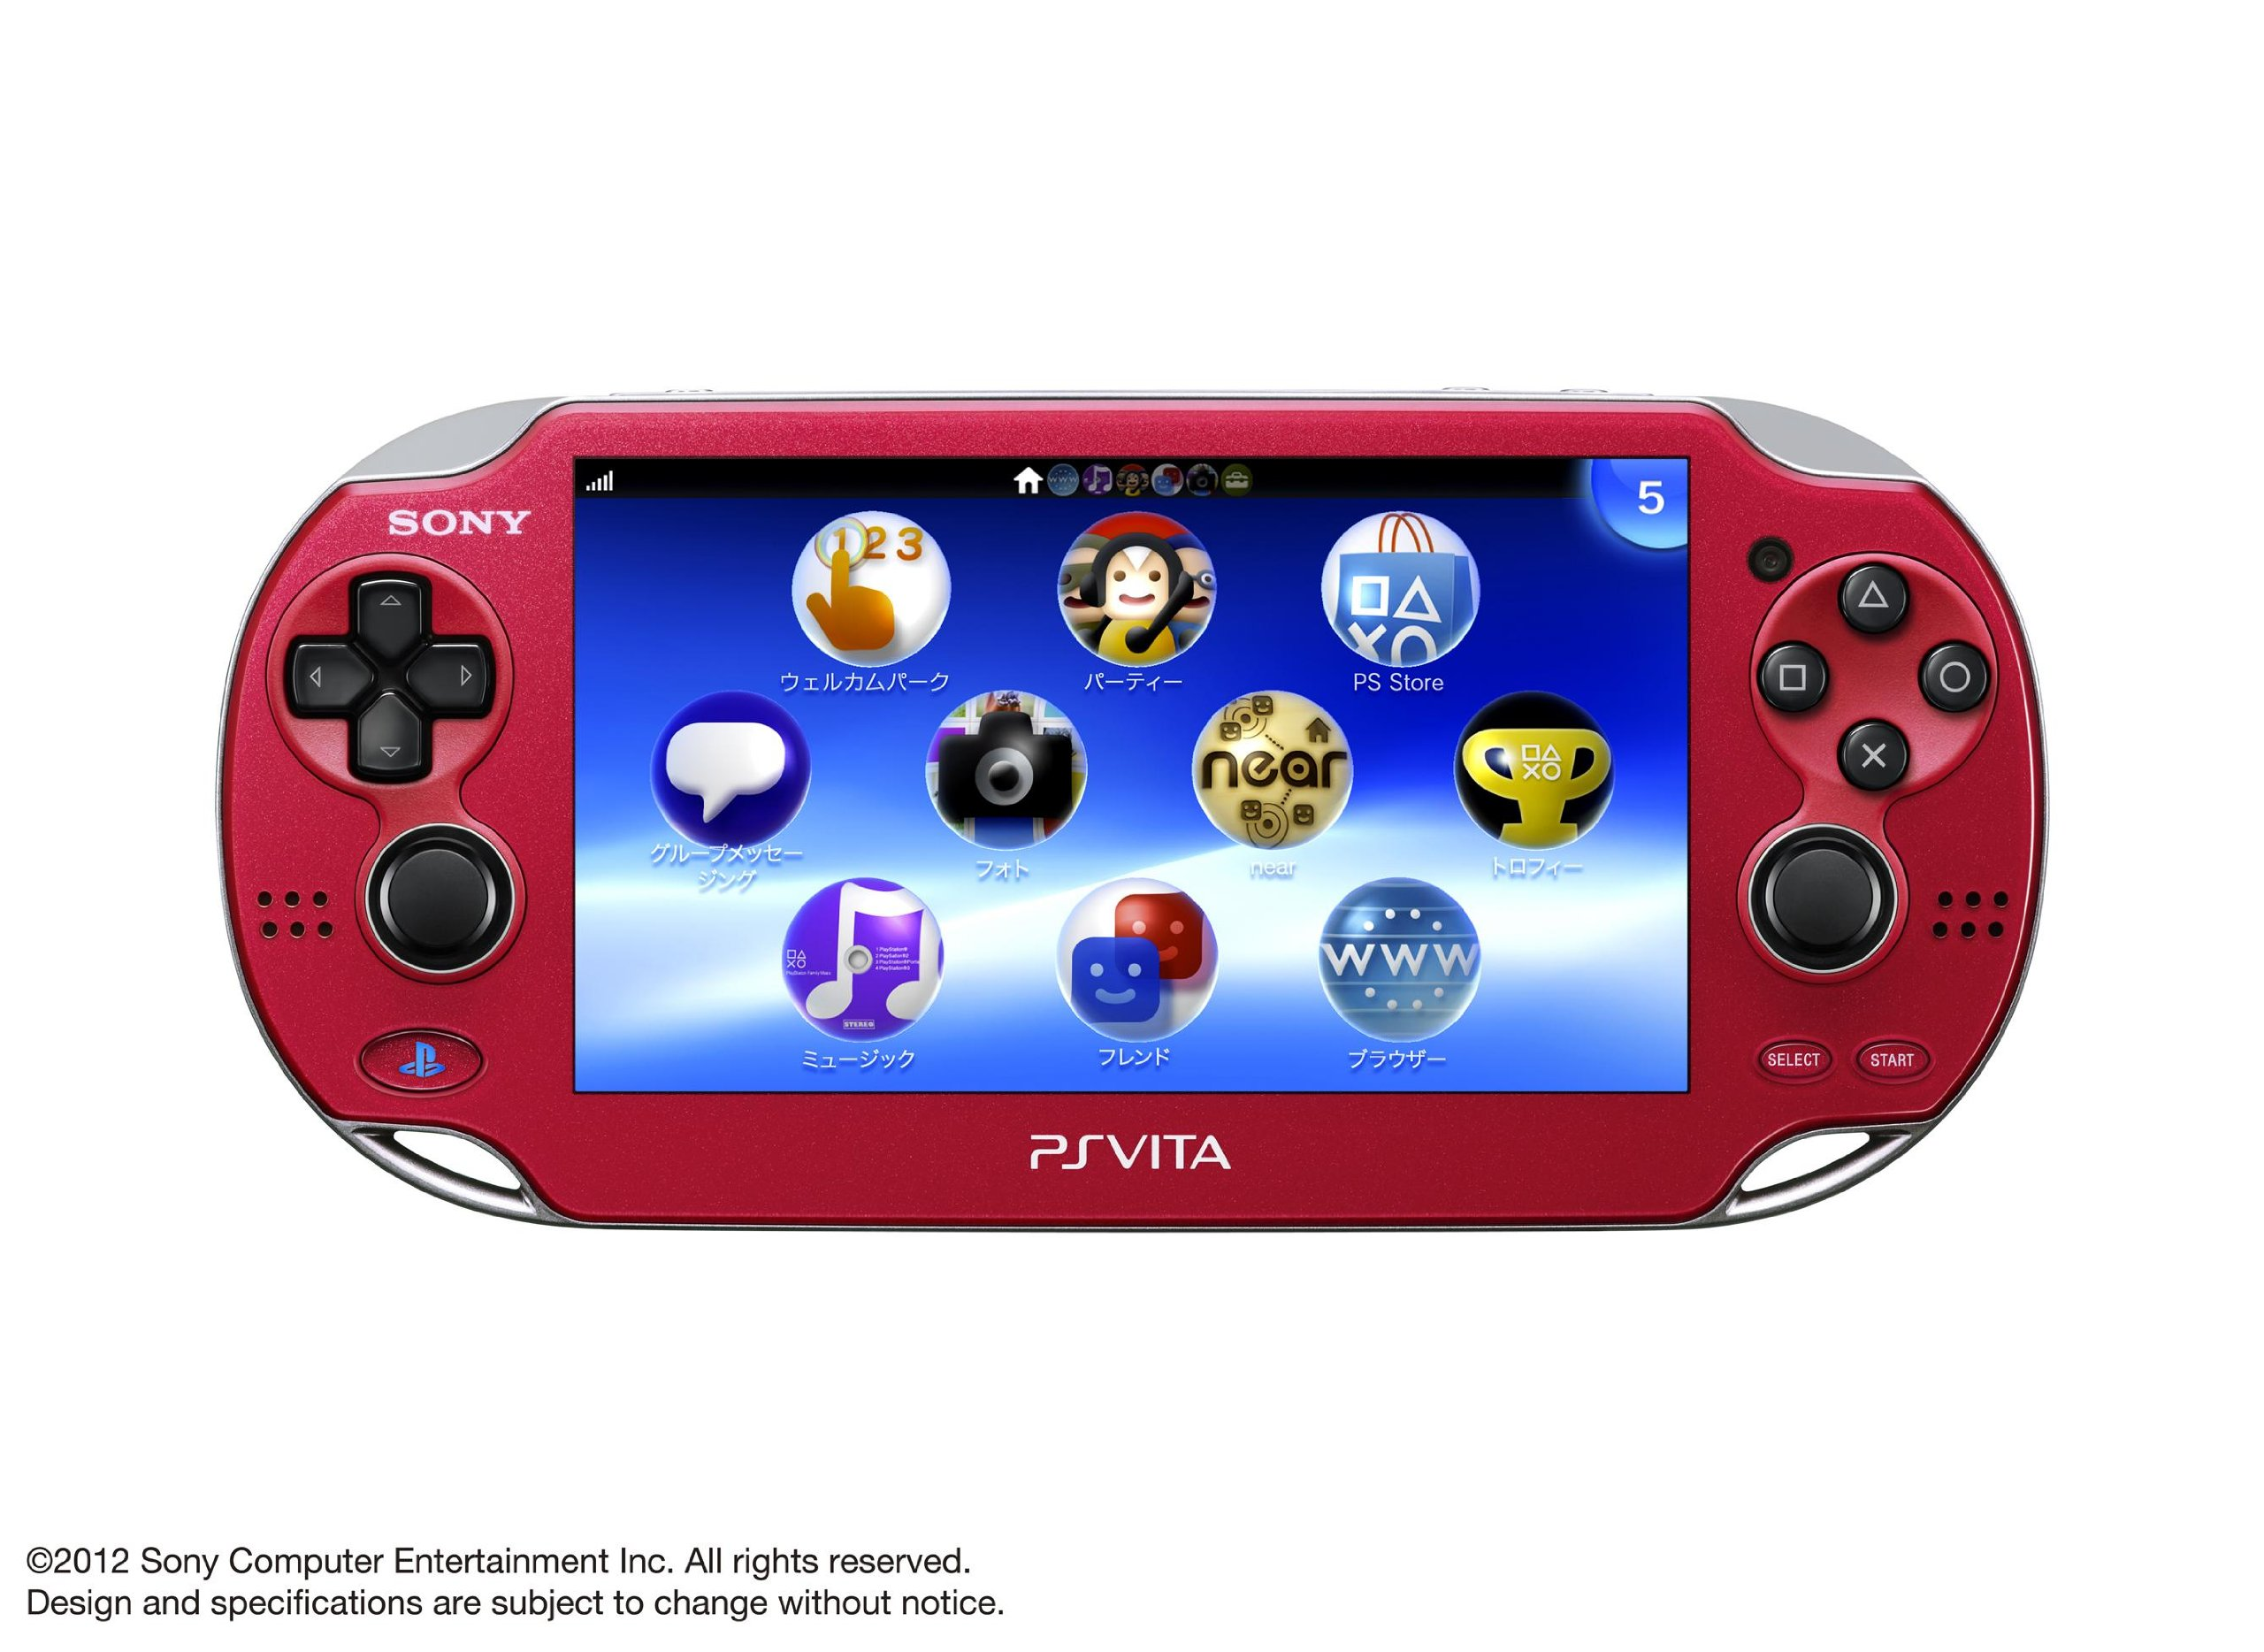 PlayStation Vita - WiFi Red - Japanese Version (only plays Japanese version PlayStation Vita games)